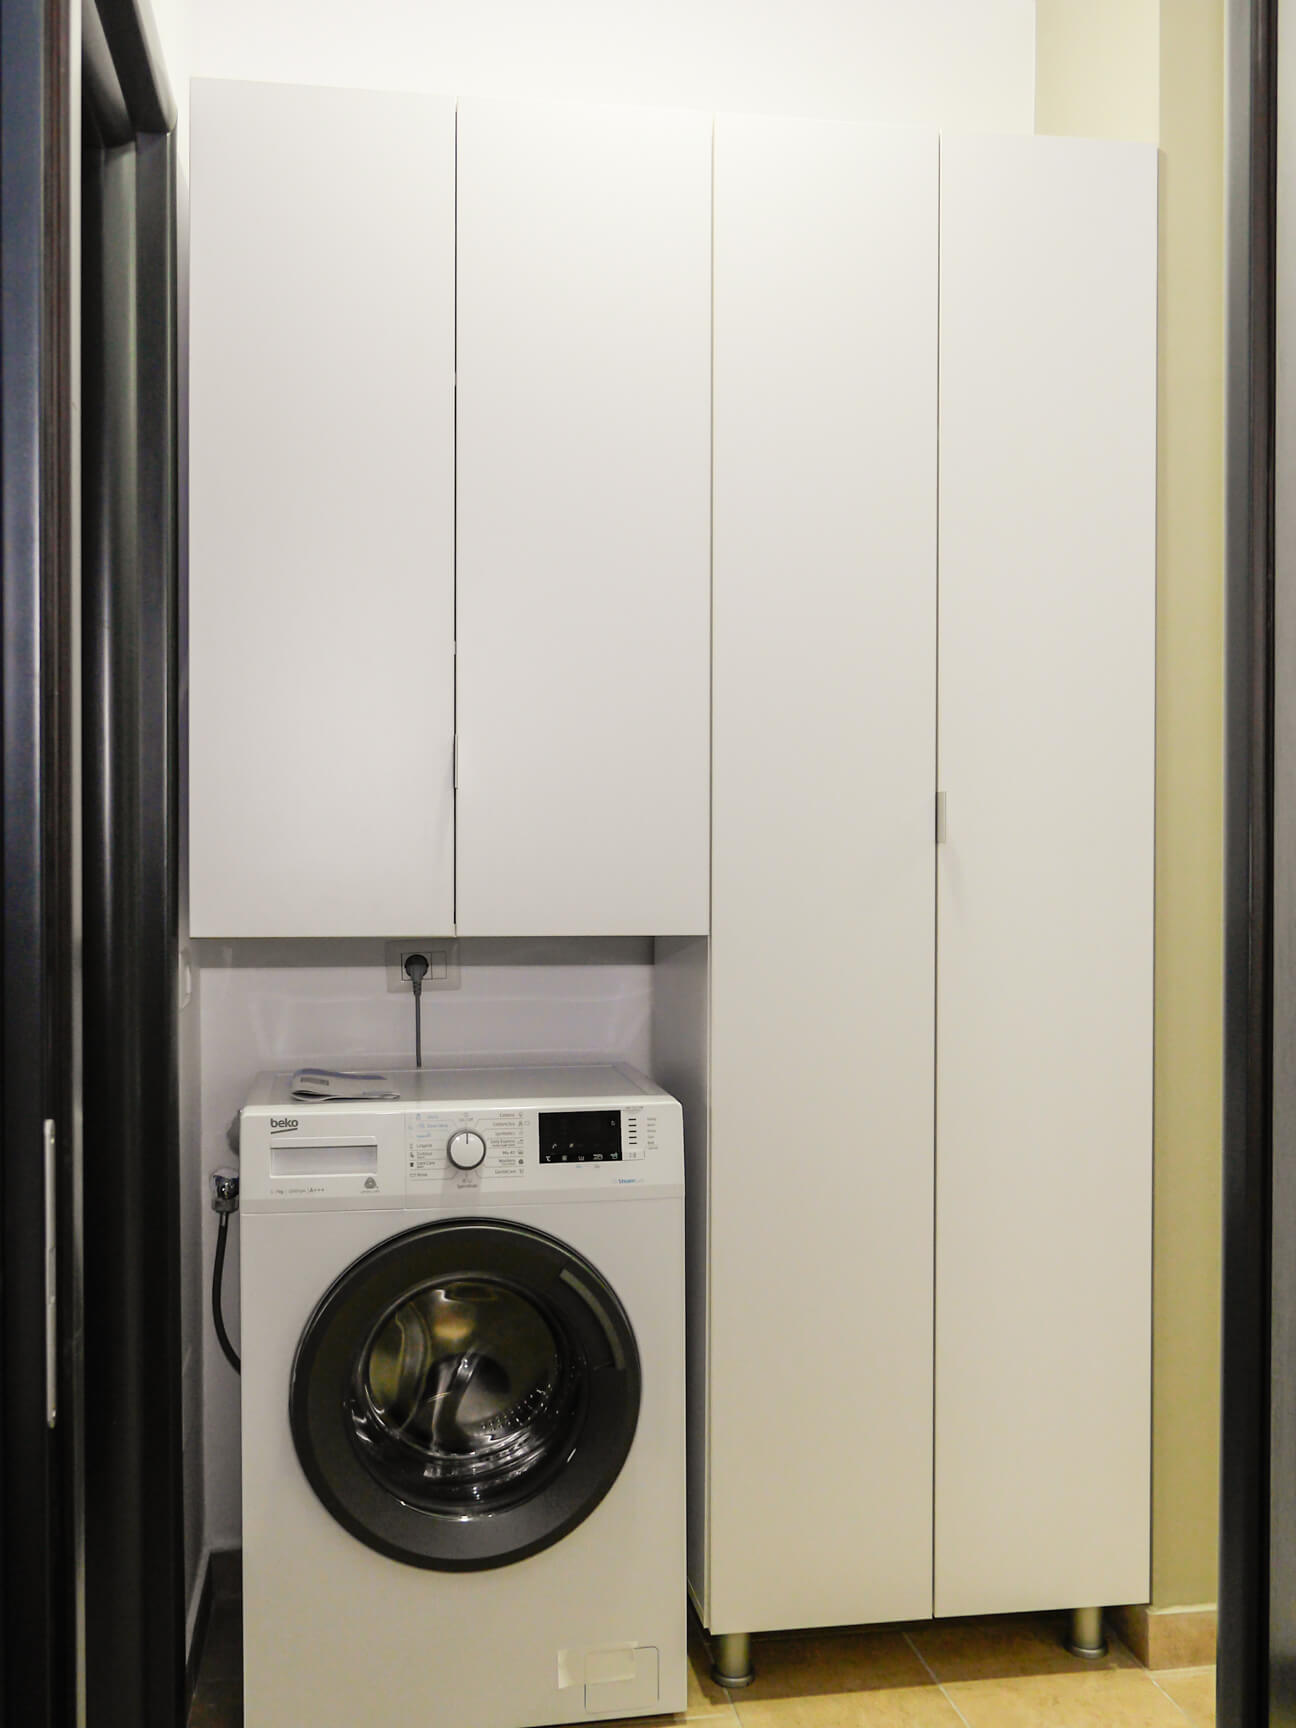 Clement Apartments - apartamente de inchiriat in regim hotelier - cazare neamt - cazare piatra neamt (7)